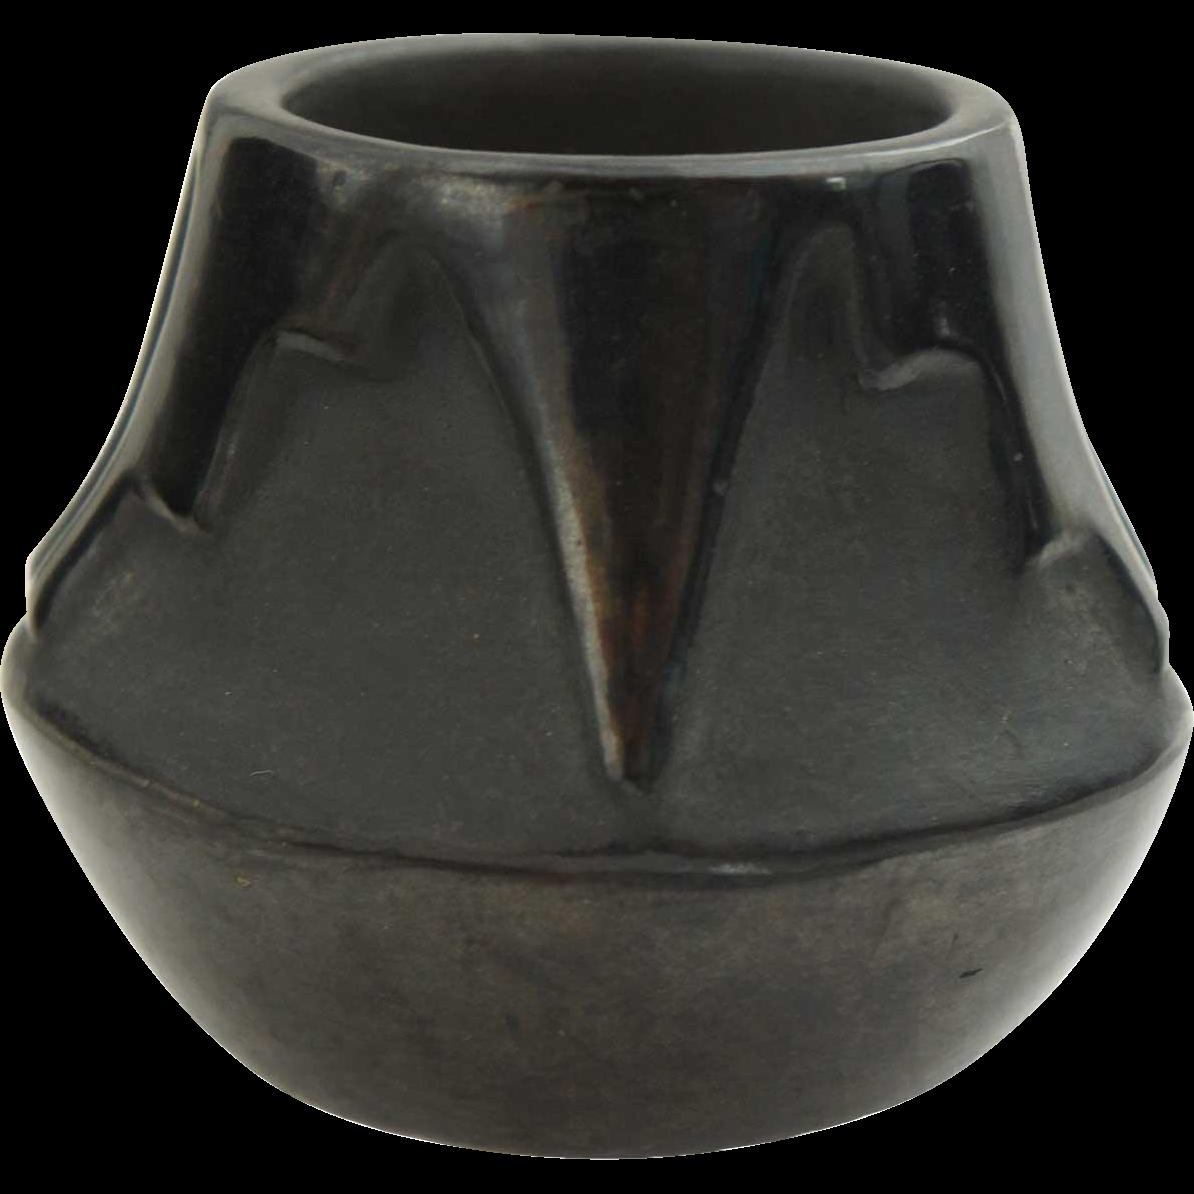 Native American ROSE GONZALES San Idelfonso Blackware Pottery Jar